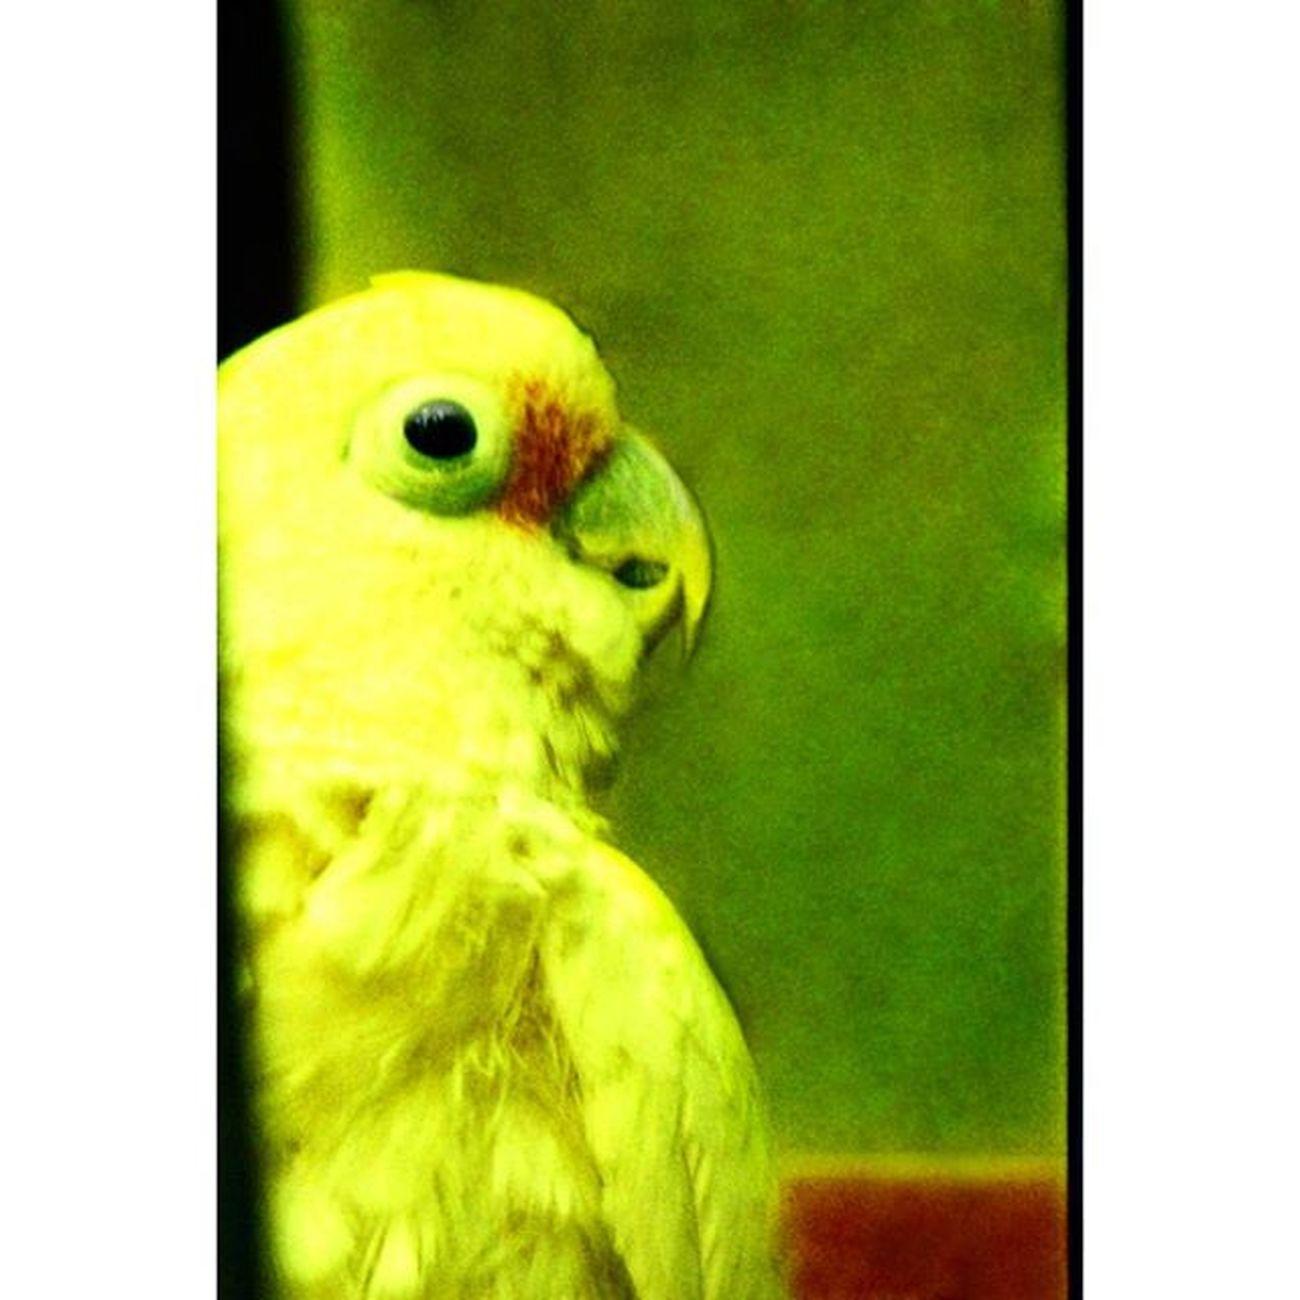 цветвинтерьере цветныекартинки Film Filmfoto 35mm Analogphotography Art Photoart Decor